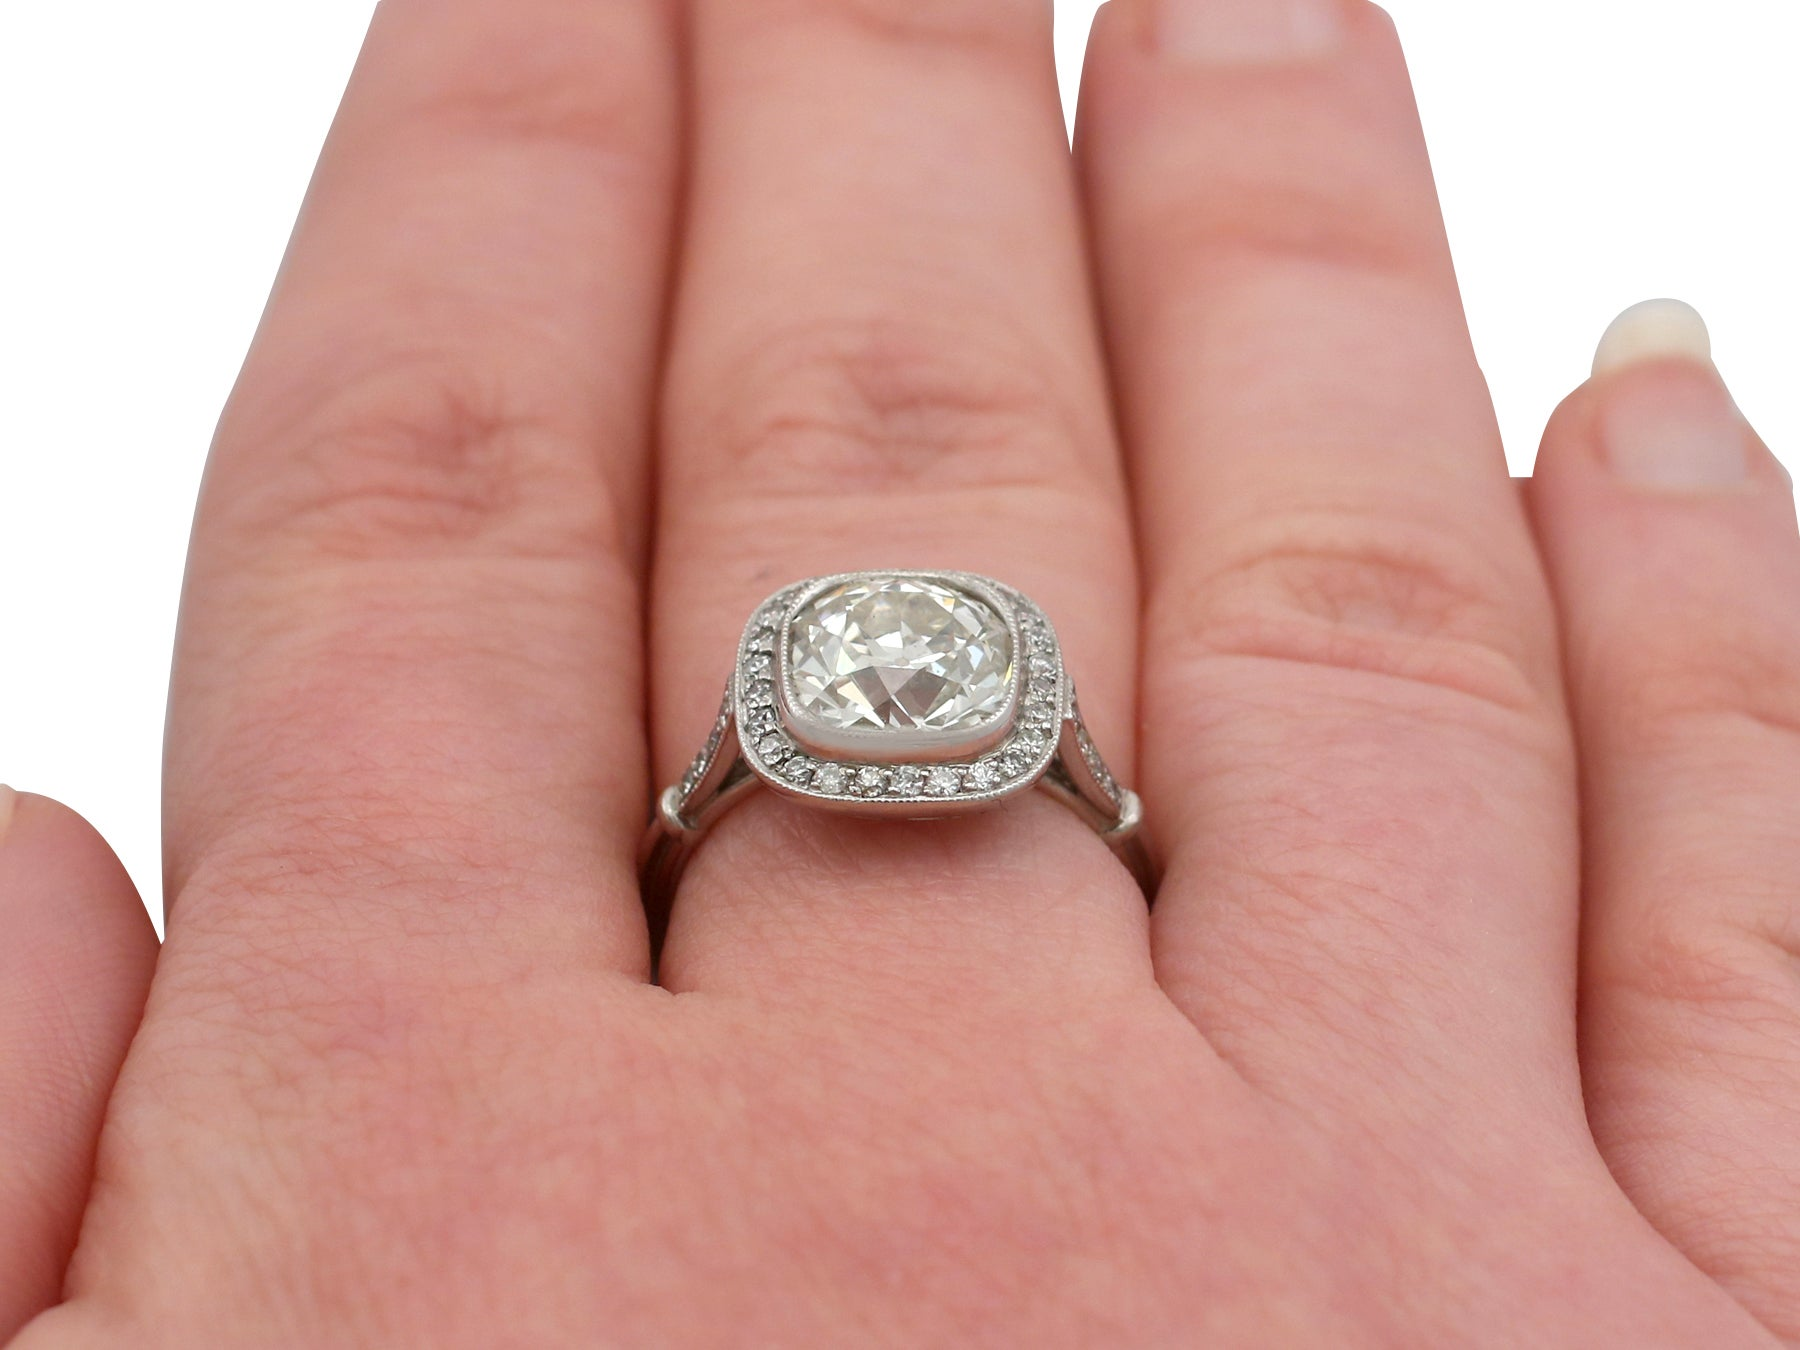 1900s 3.31 Carat Diamond and Platinum Halo Engagement Ring at 1stdibs